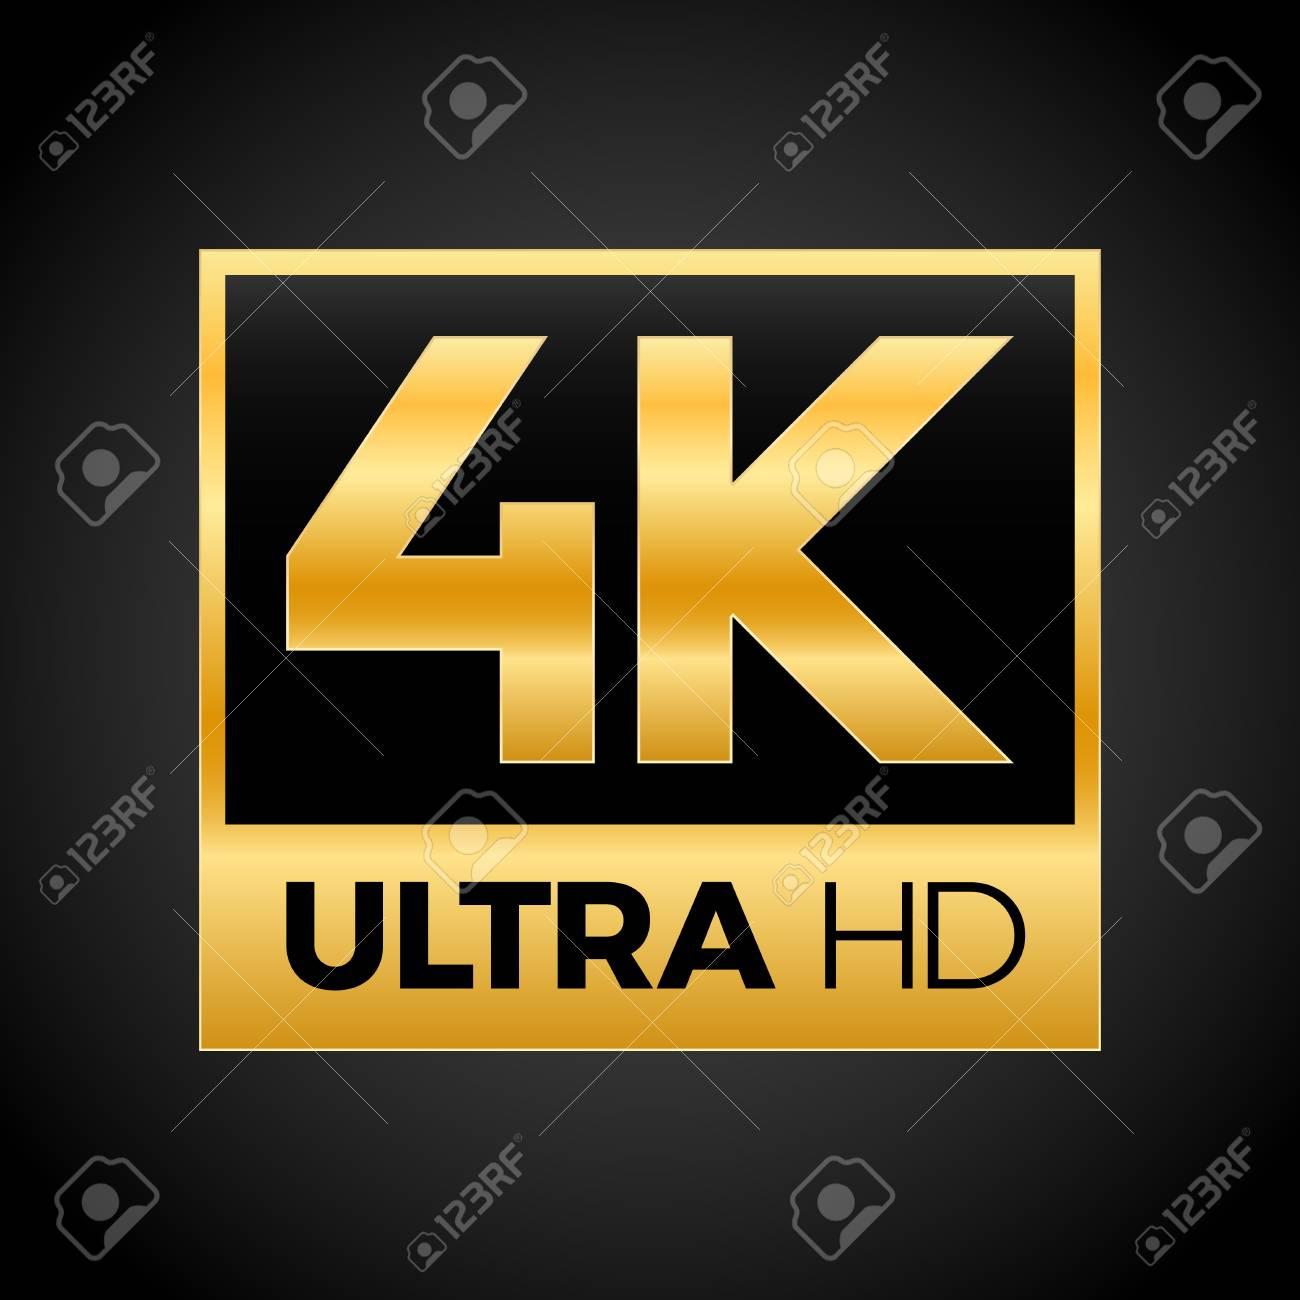 4K Ultra HD symbol, High definition 4K resolution mark, UHD - 2160p - 99466834